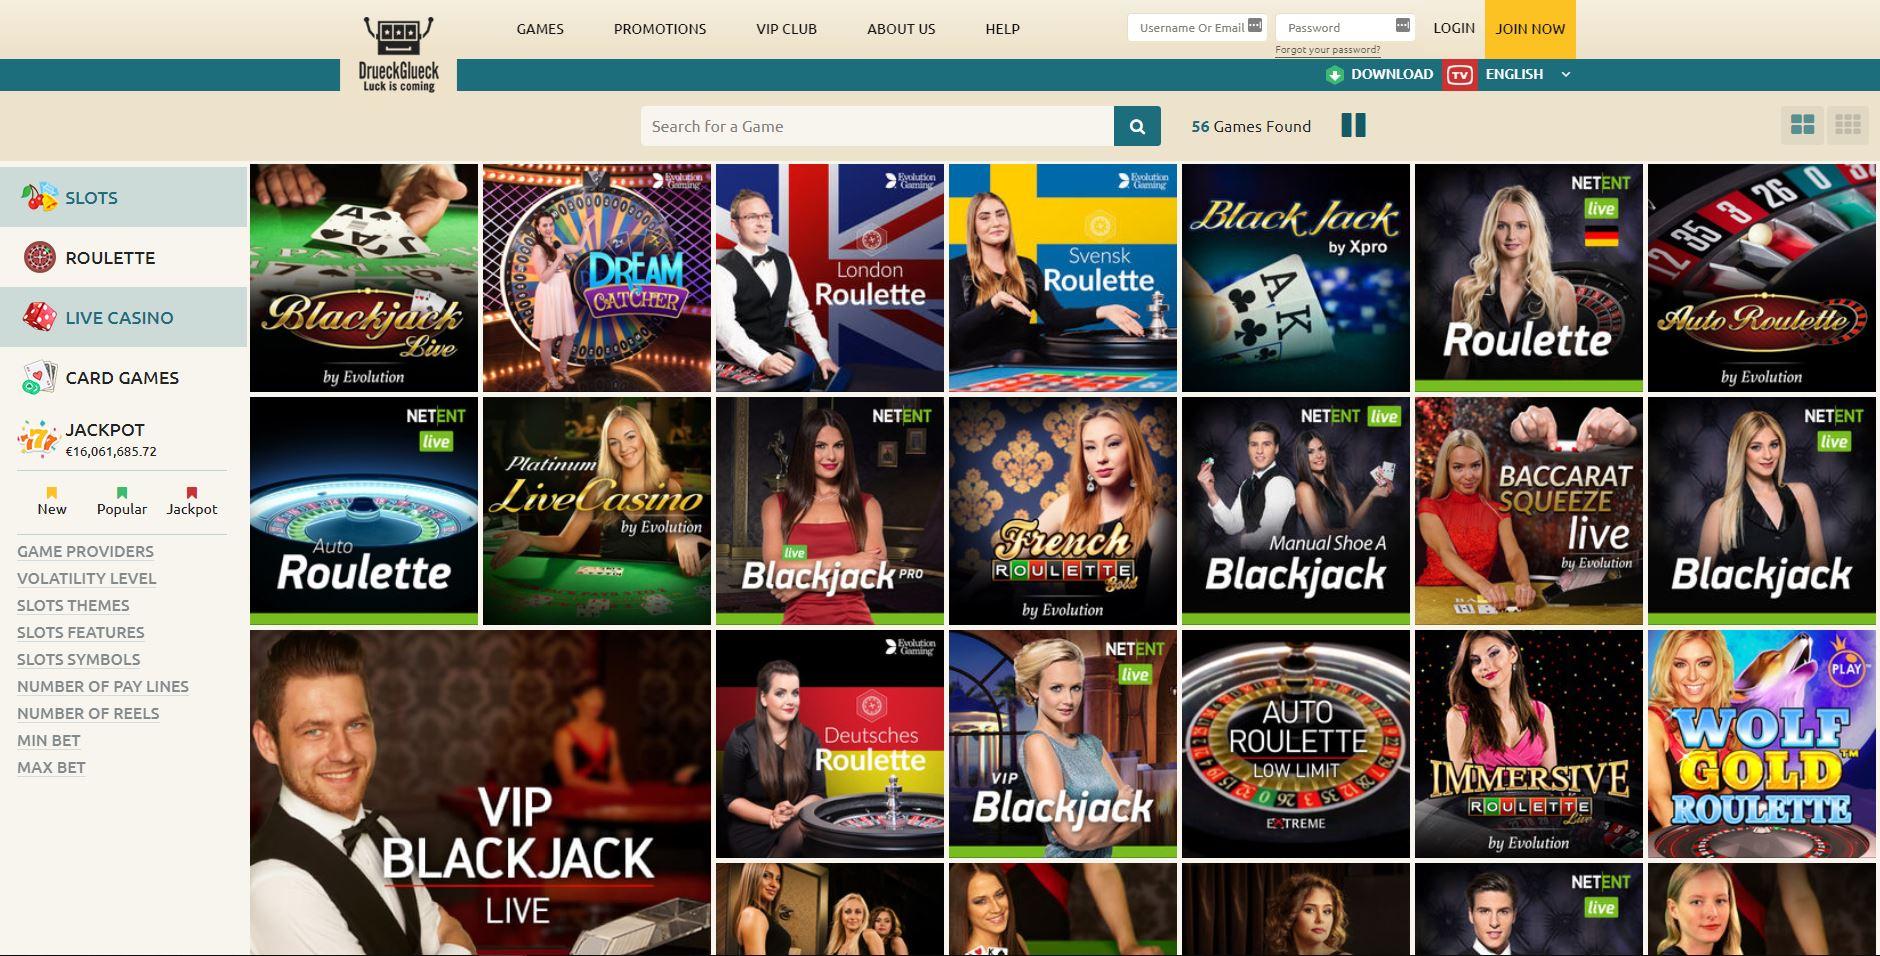 DrueckGlueck Casino lobby